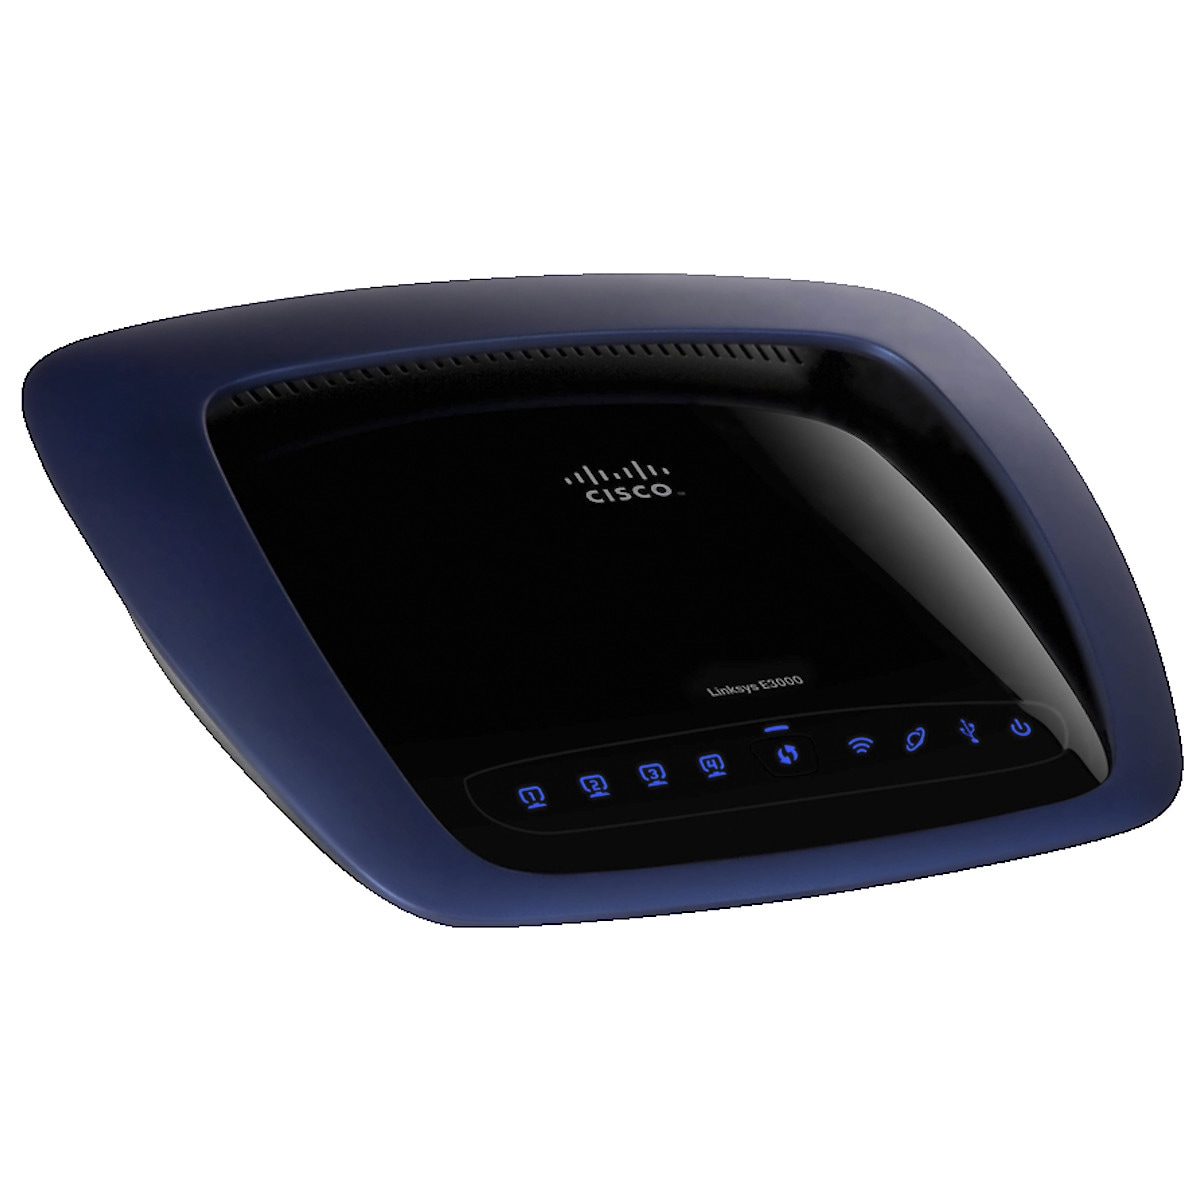 Trådlös router Linksys E3000 med dual band 300 Mbps